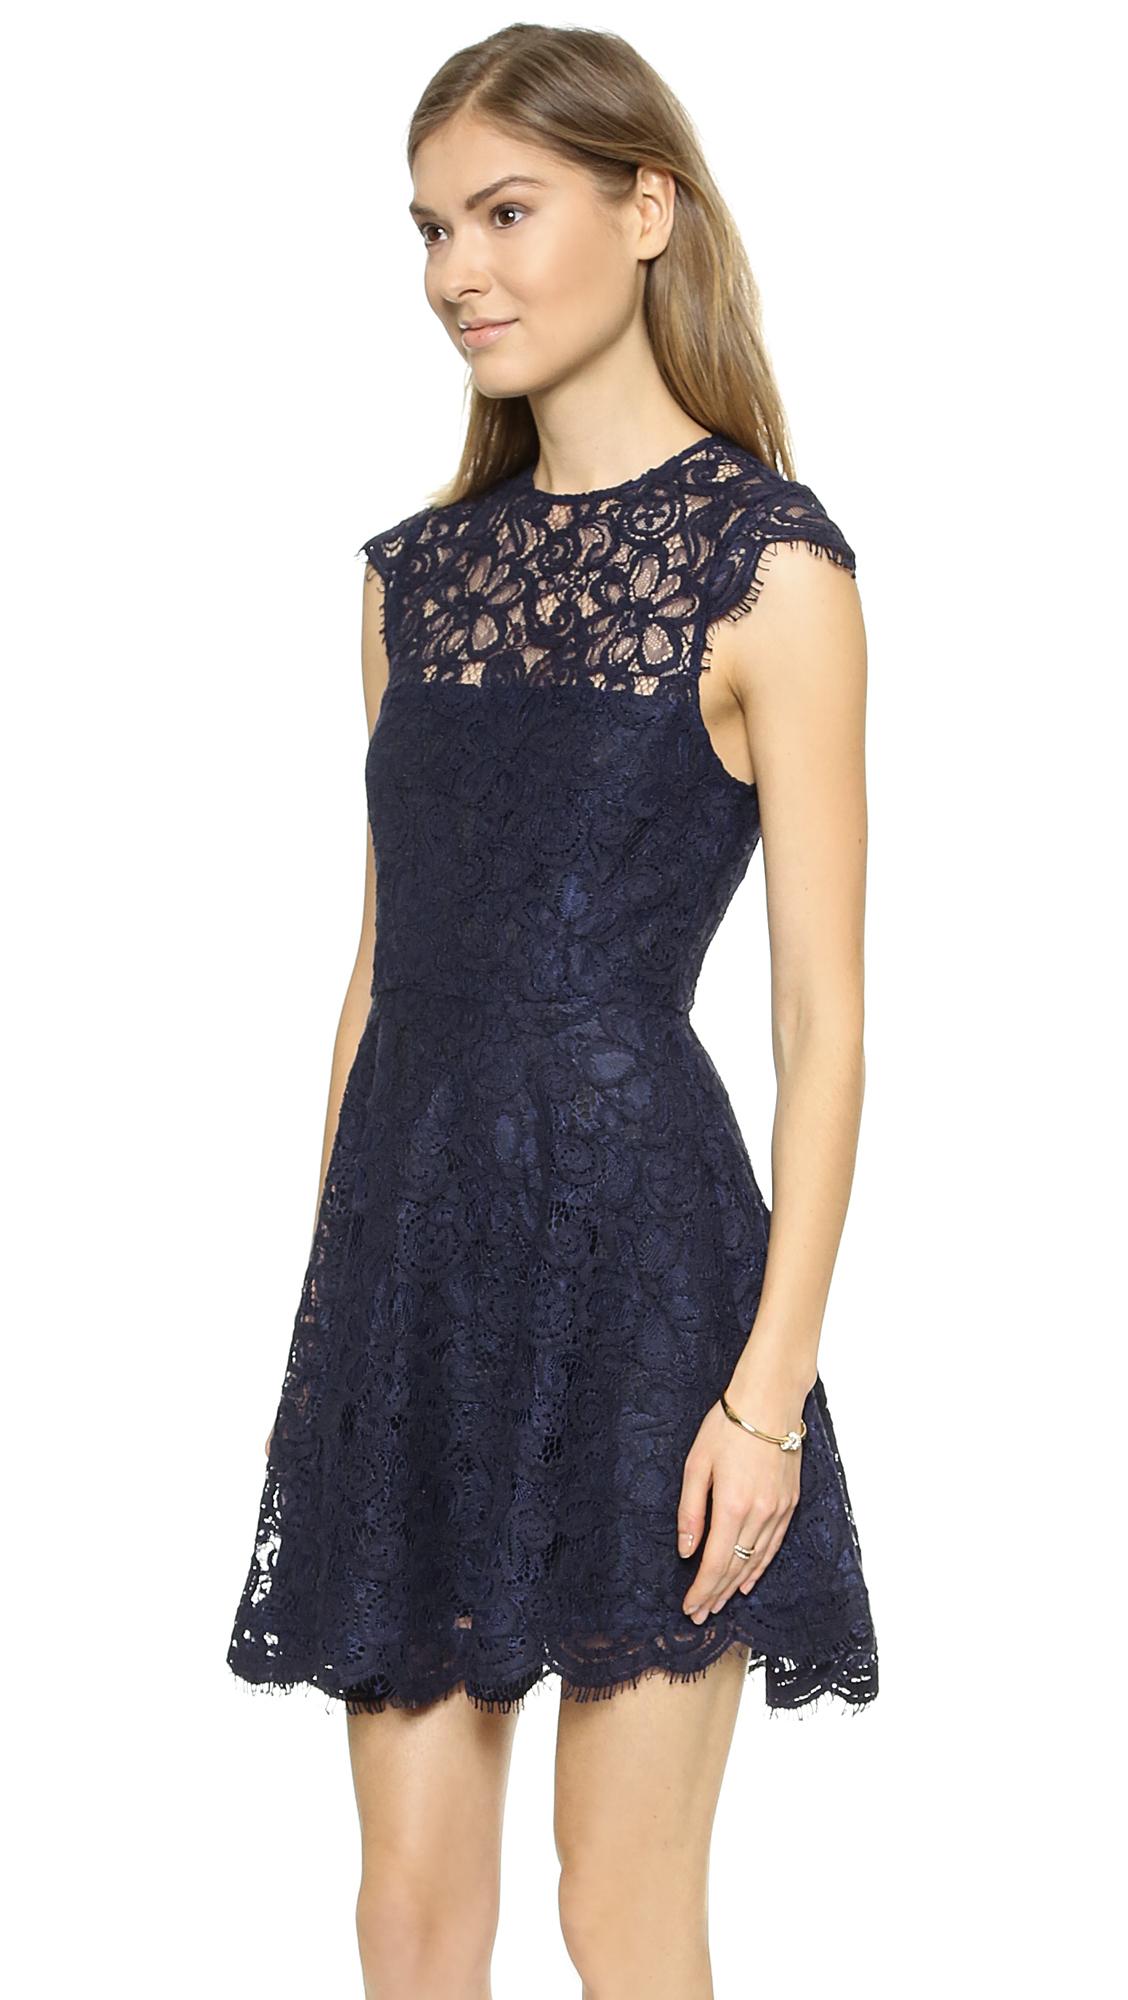 Bb dakota lace dress